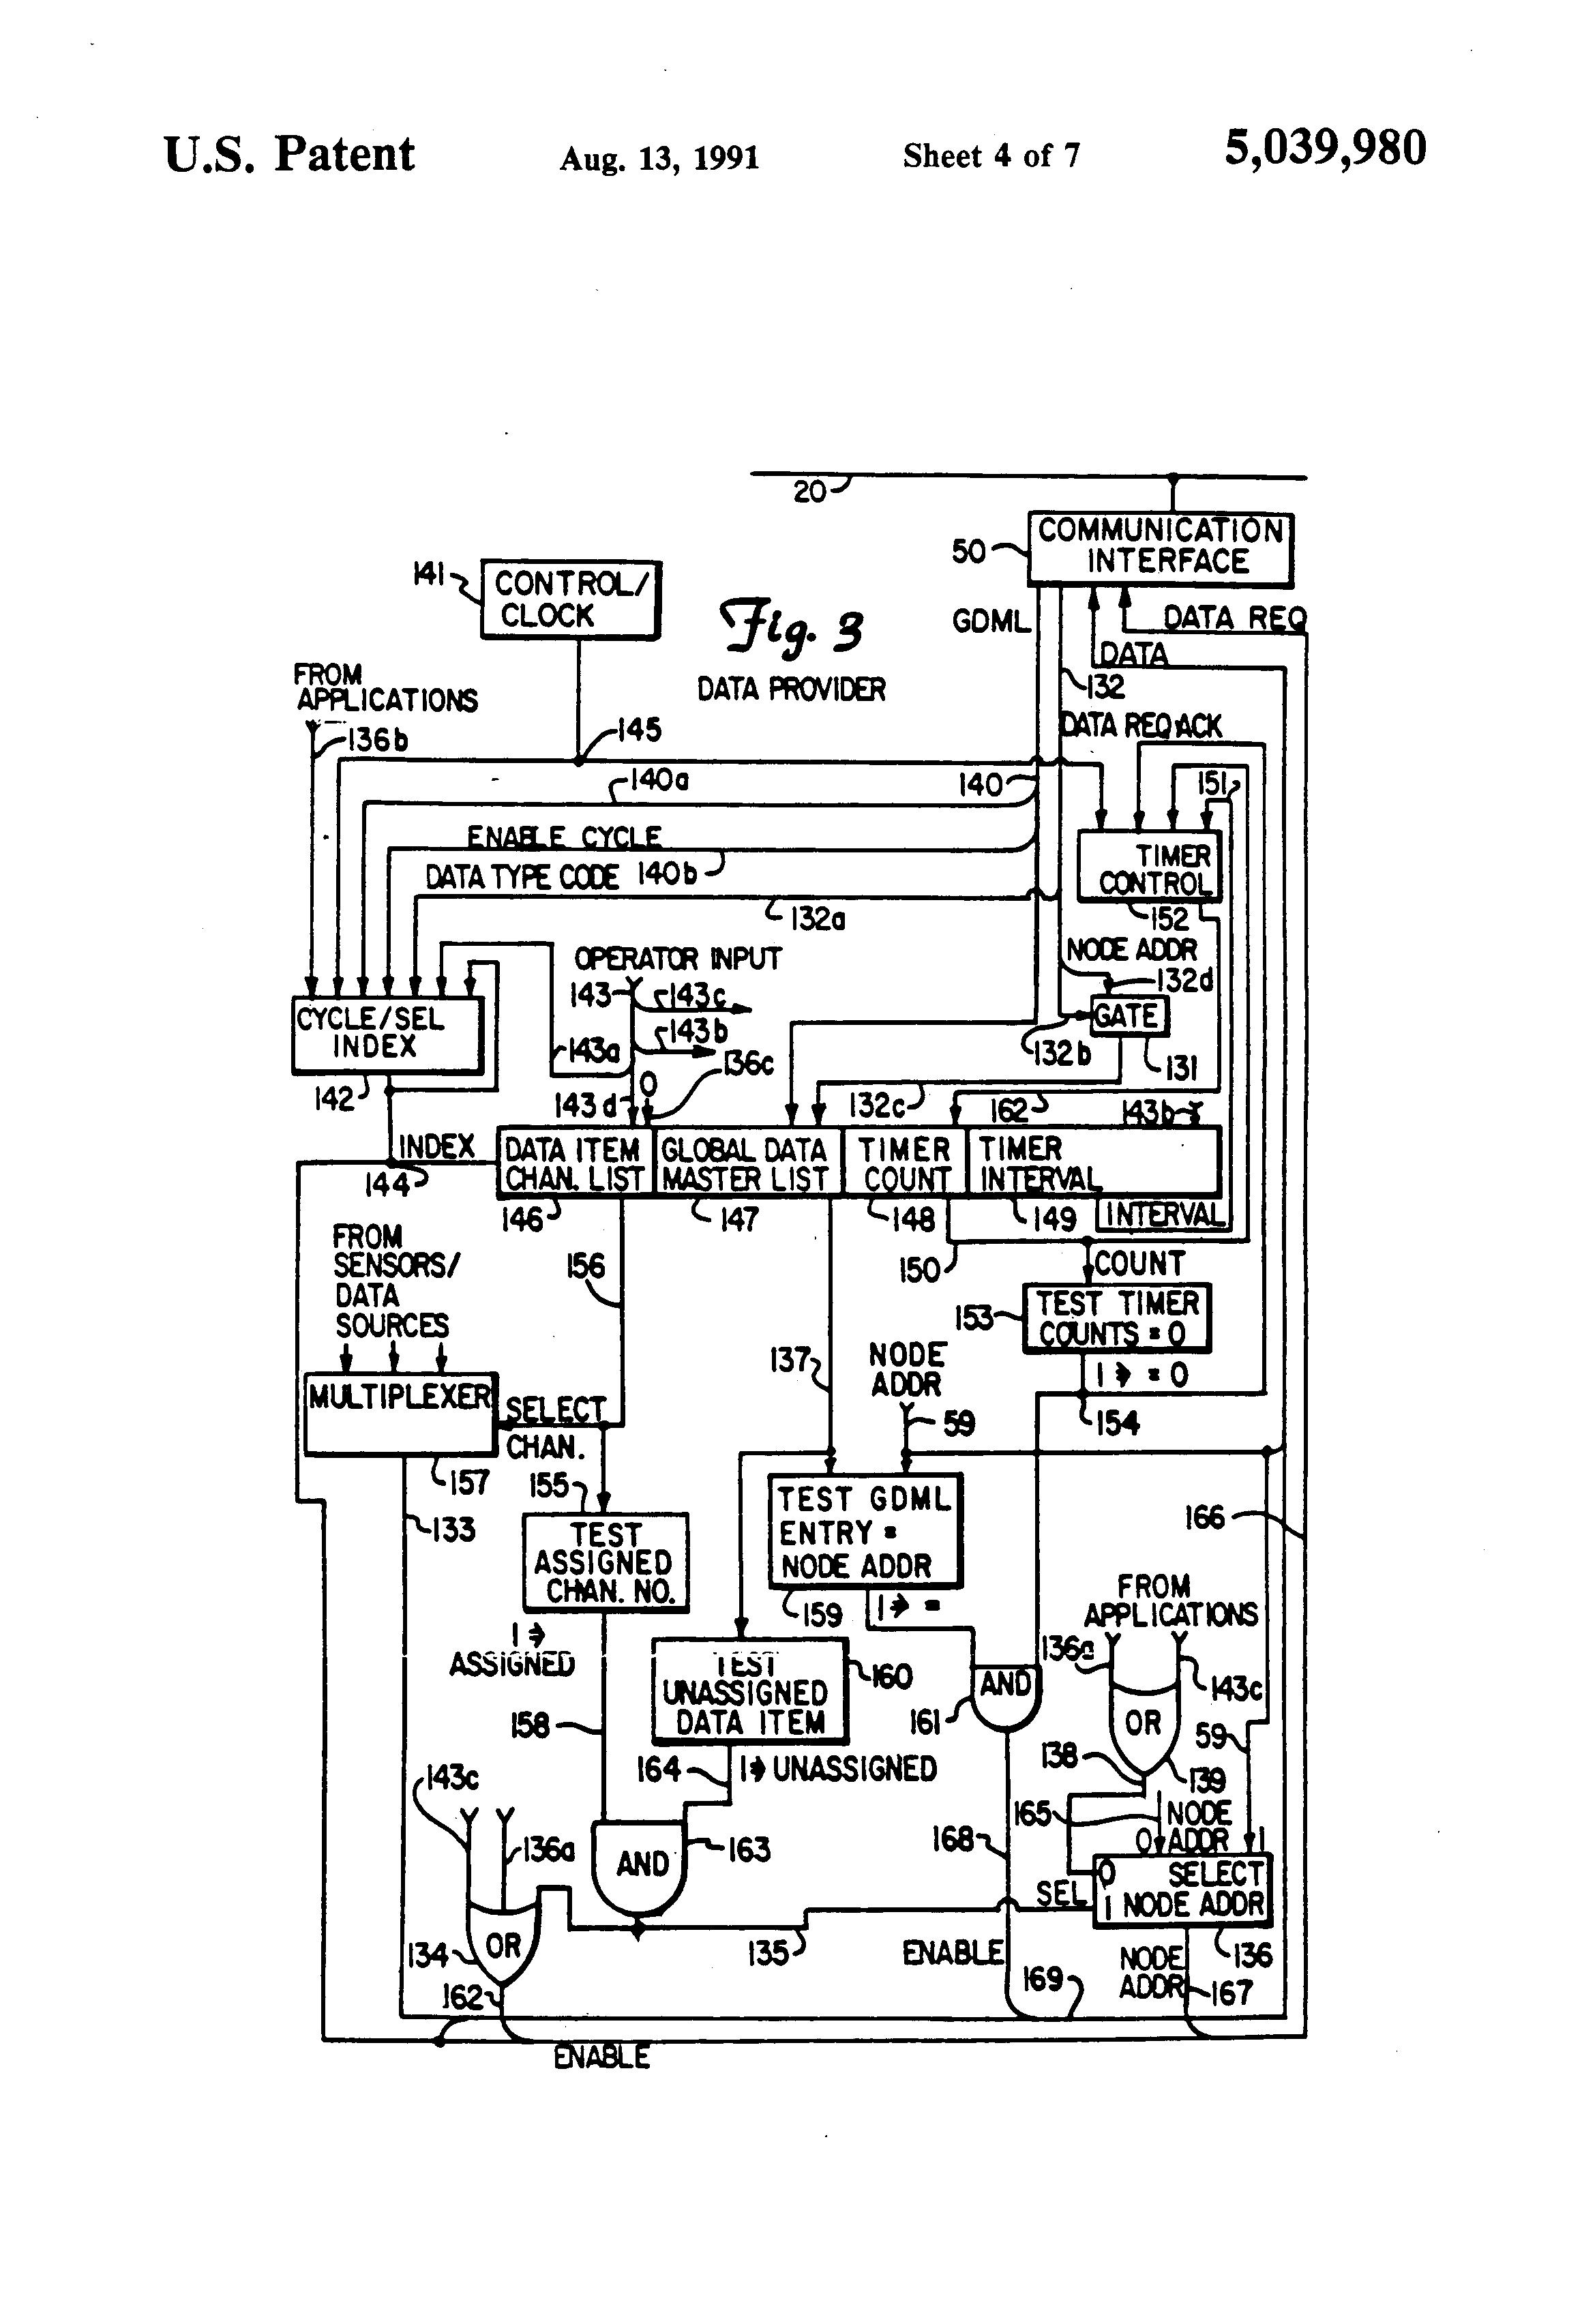 True Refrigerator Compressor Wiring Diagram - Ford F150 Trailer Wiring  Diagram for Wiring Diagram Schematics | True Refrigerator Compressor Wiring Diagram |  | Wiring Diagram Schematics